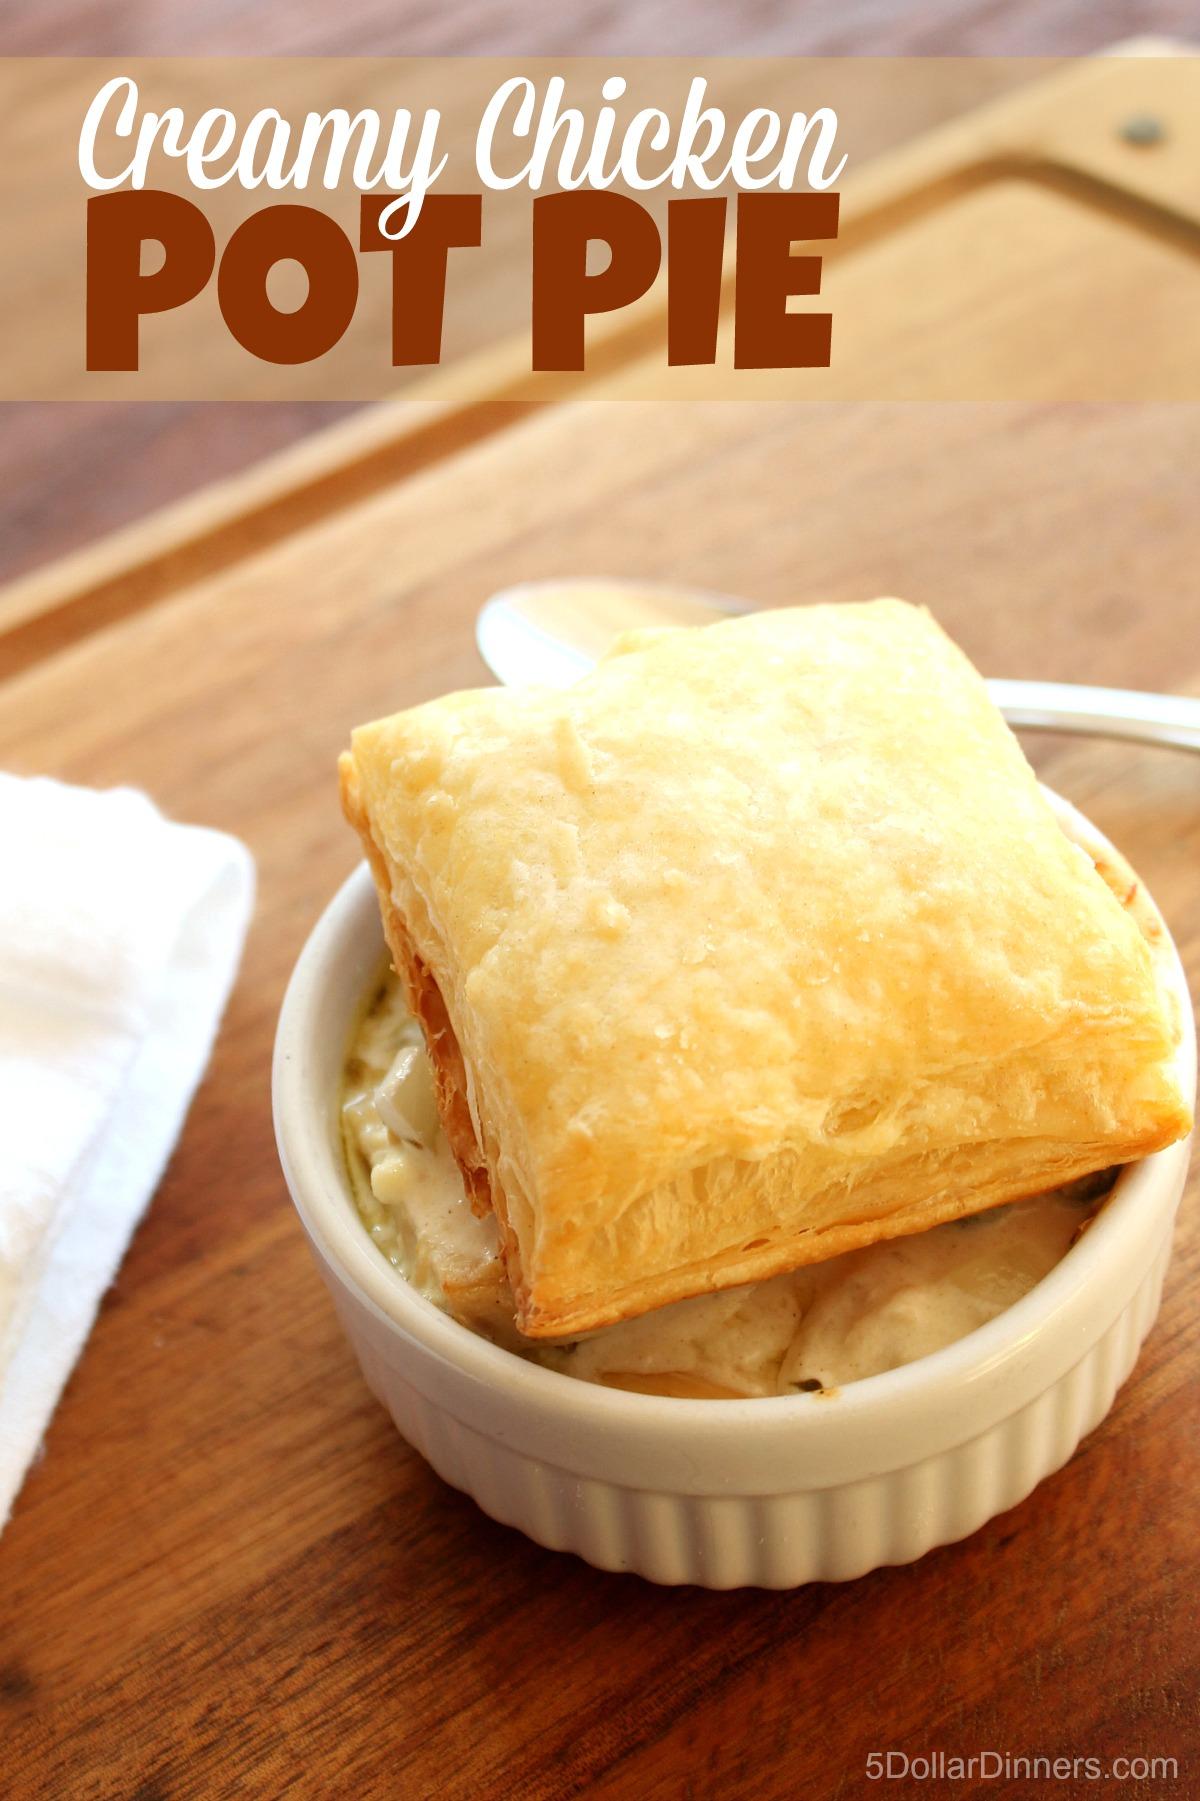 Creamy Chicken Pot Pie from 5DollarDinners.com